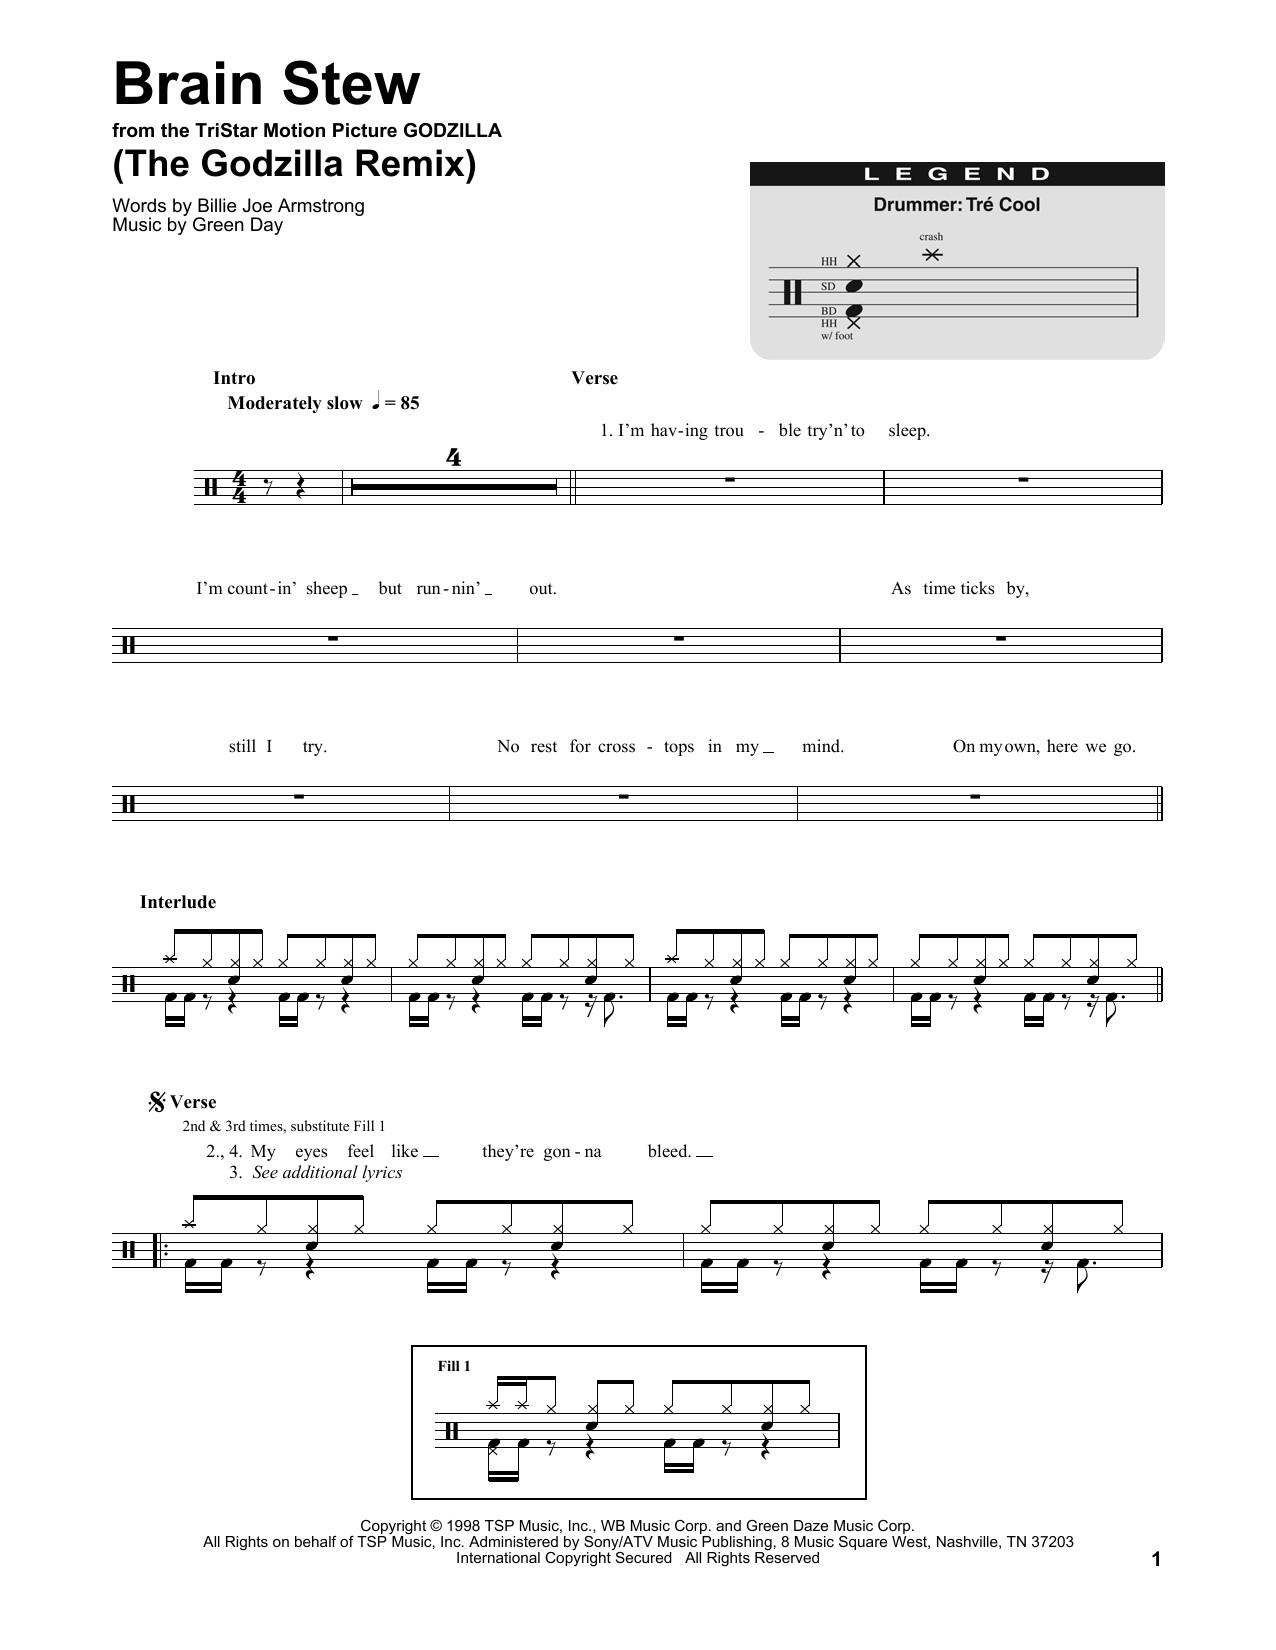 Brain Stew Chords  Brain Stew The Godzilla Remix sheet music by Green Day